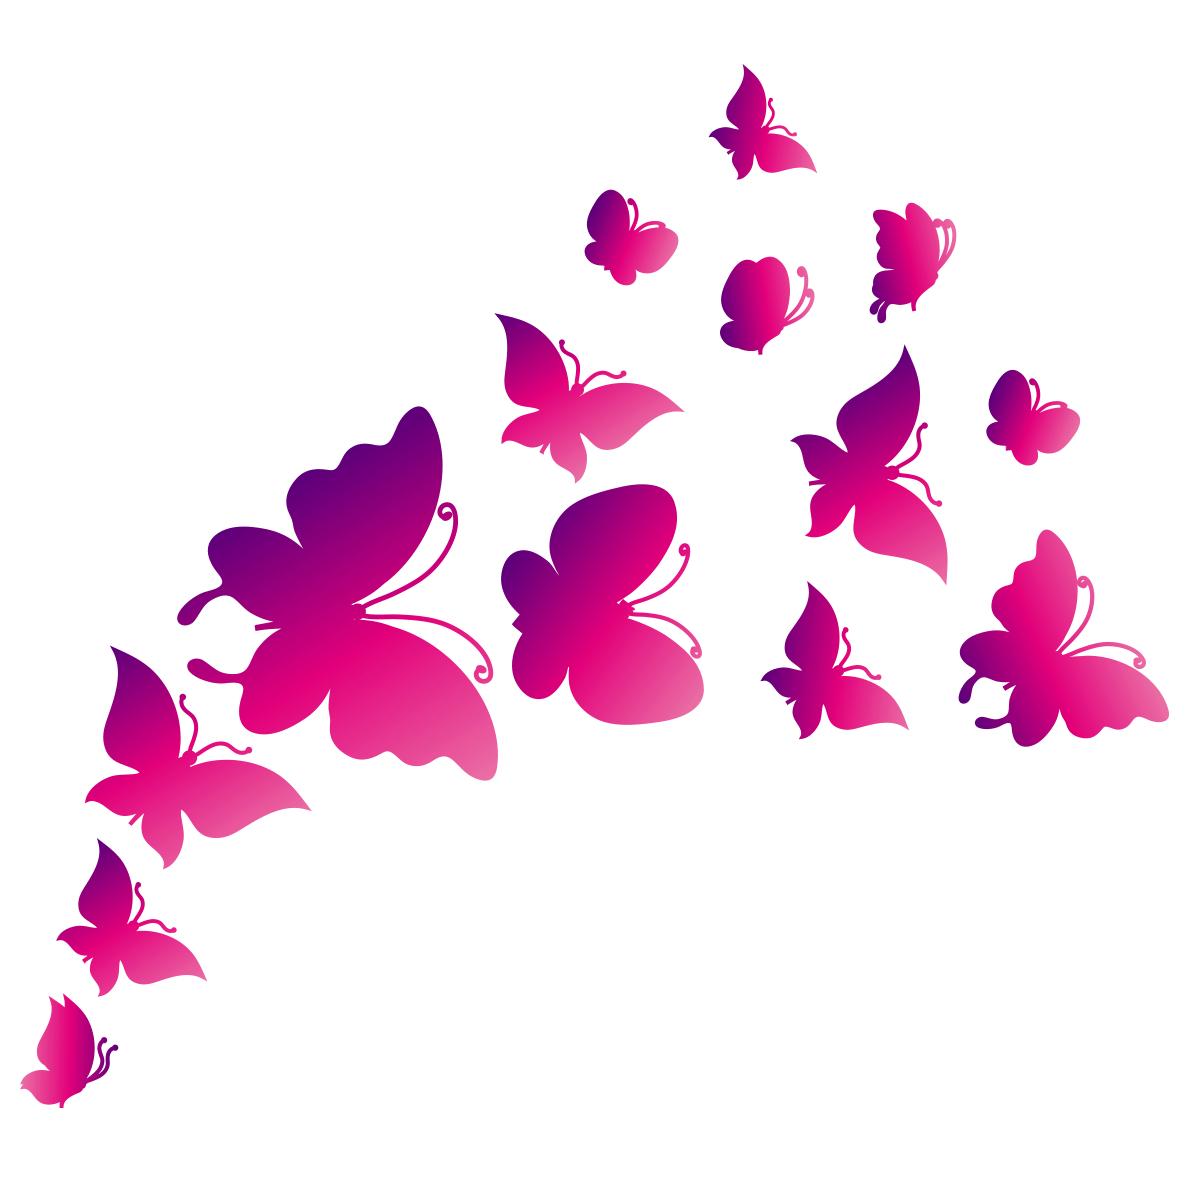 Mural Wall Design Stickers Papillons Rose Ciabiz Com